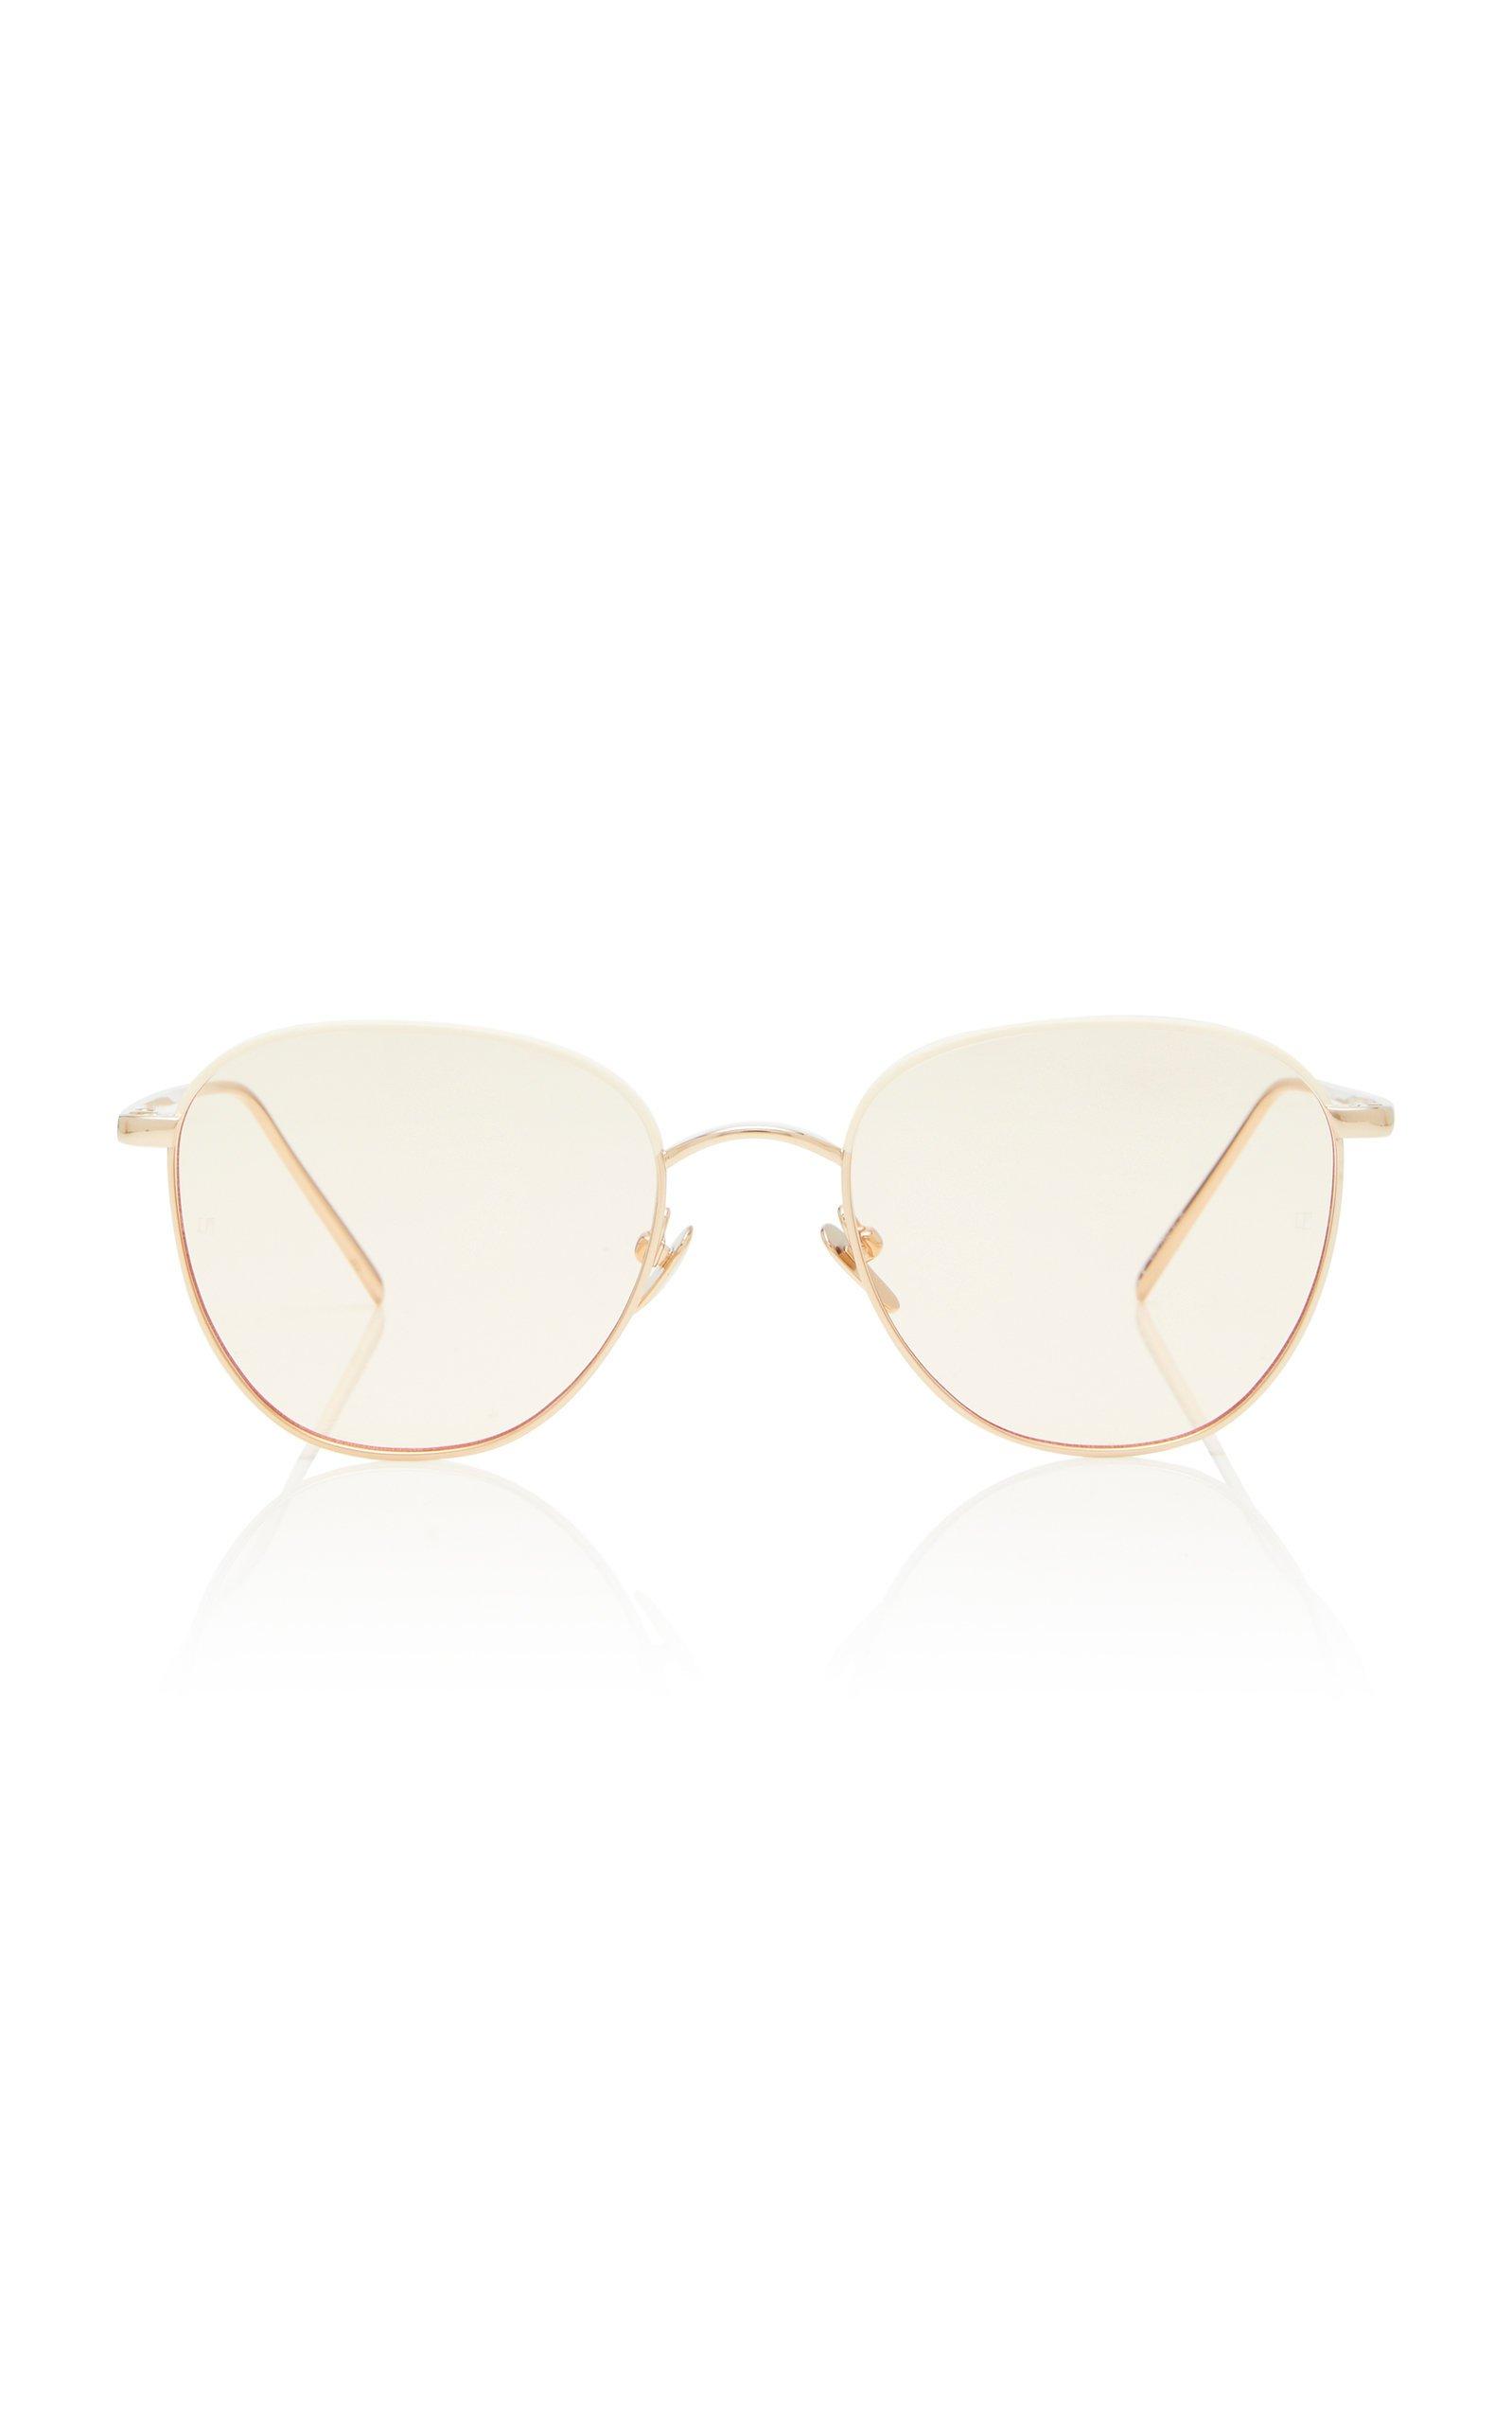 Linda Farrow Gold-Tone Metal Aviator Sunglasses